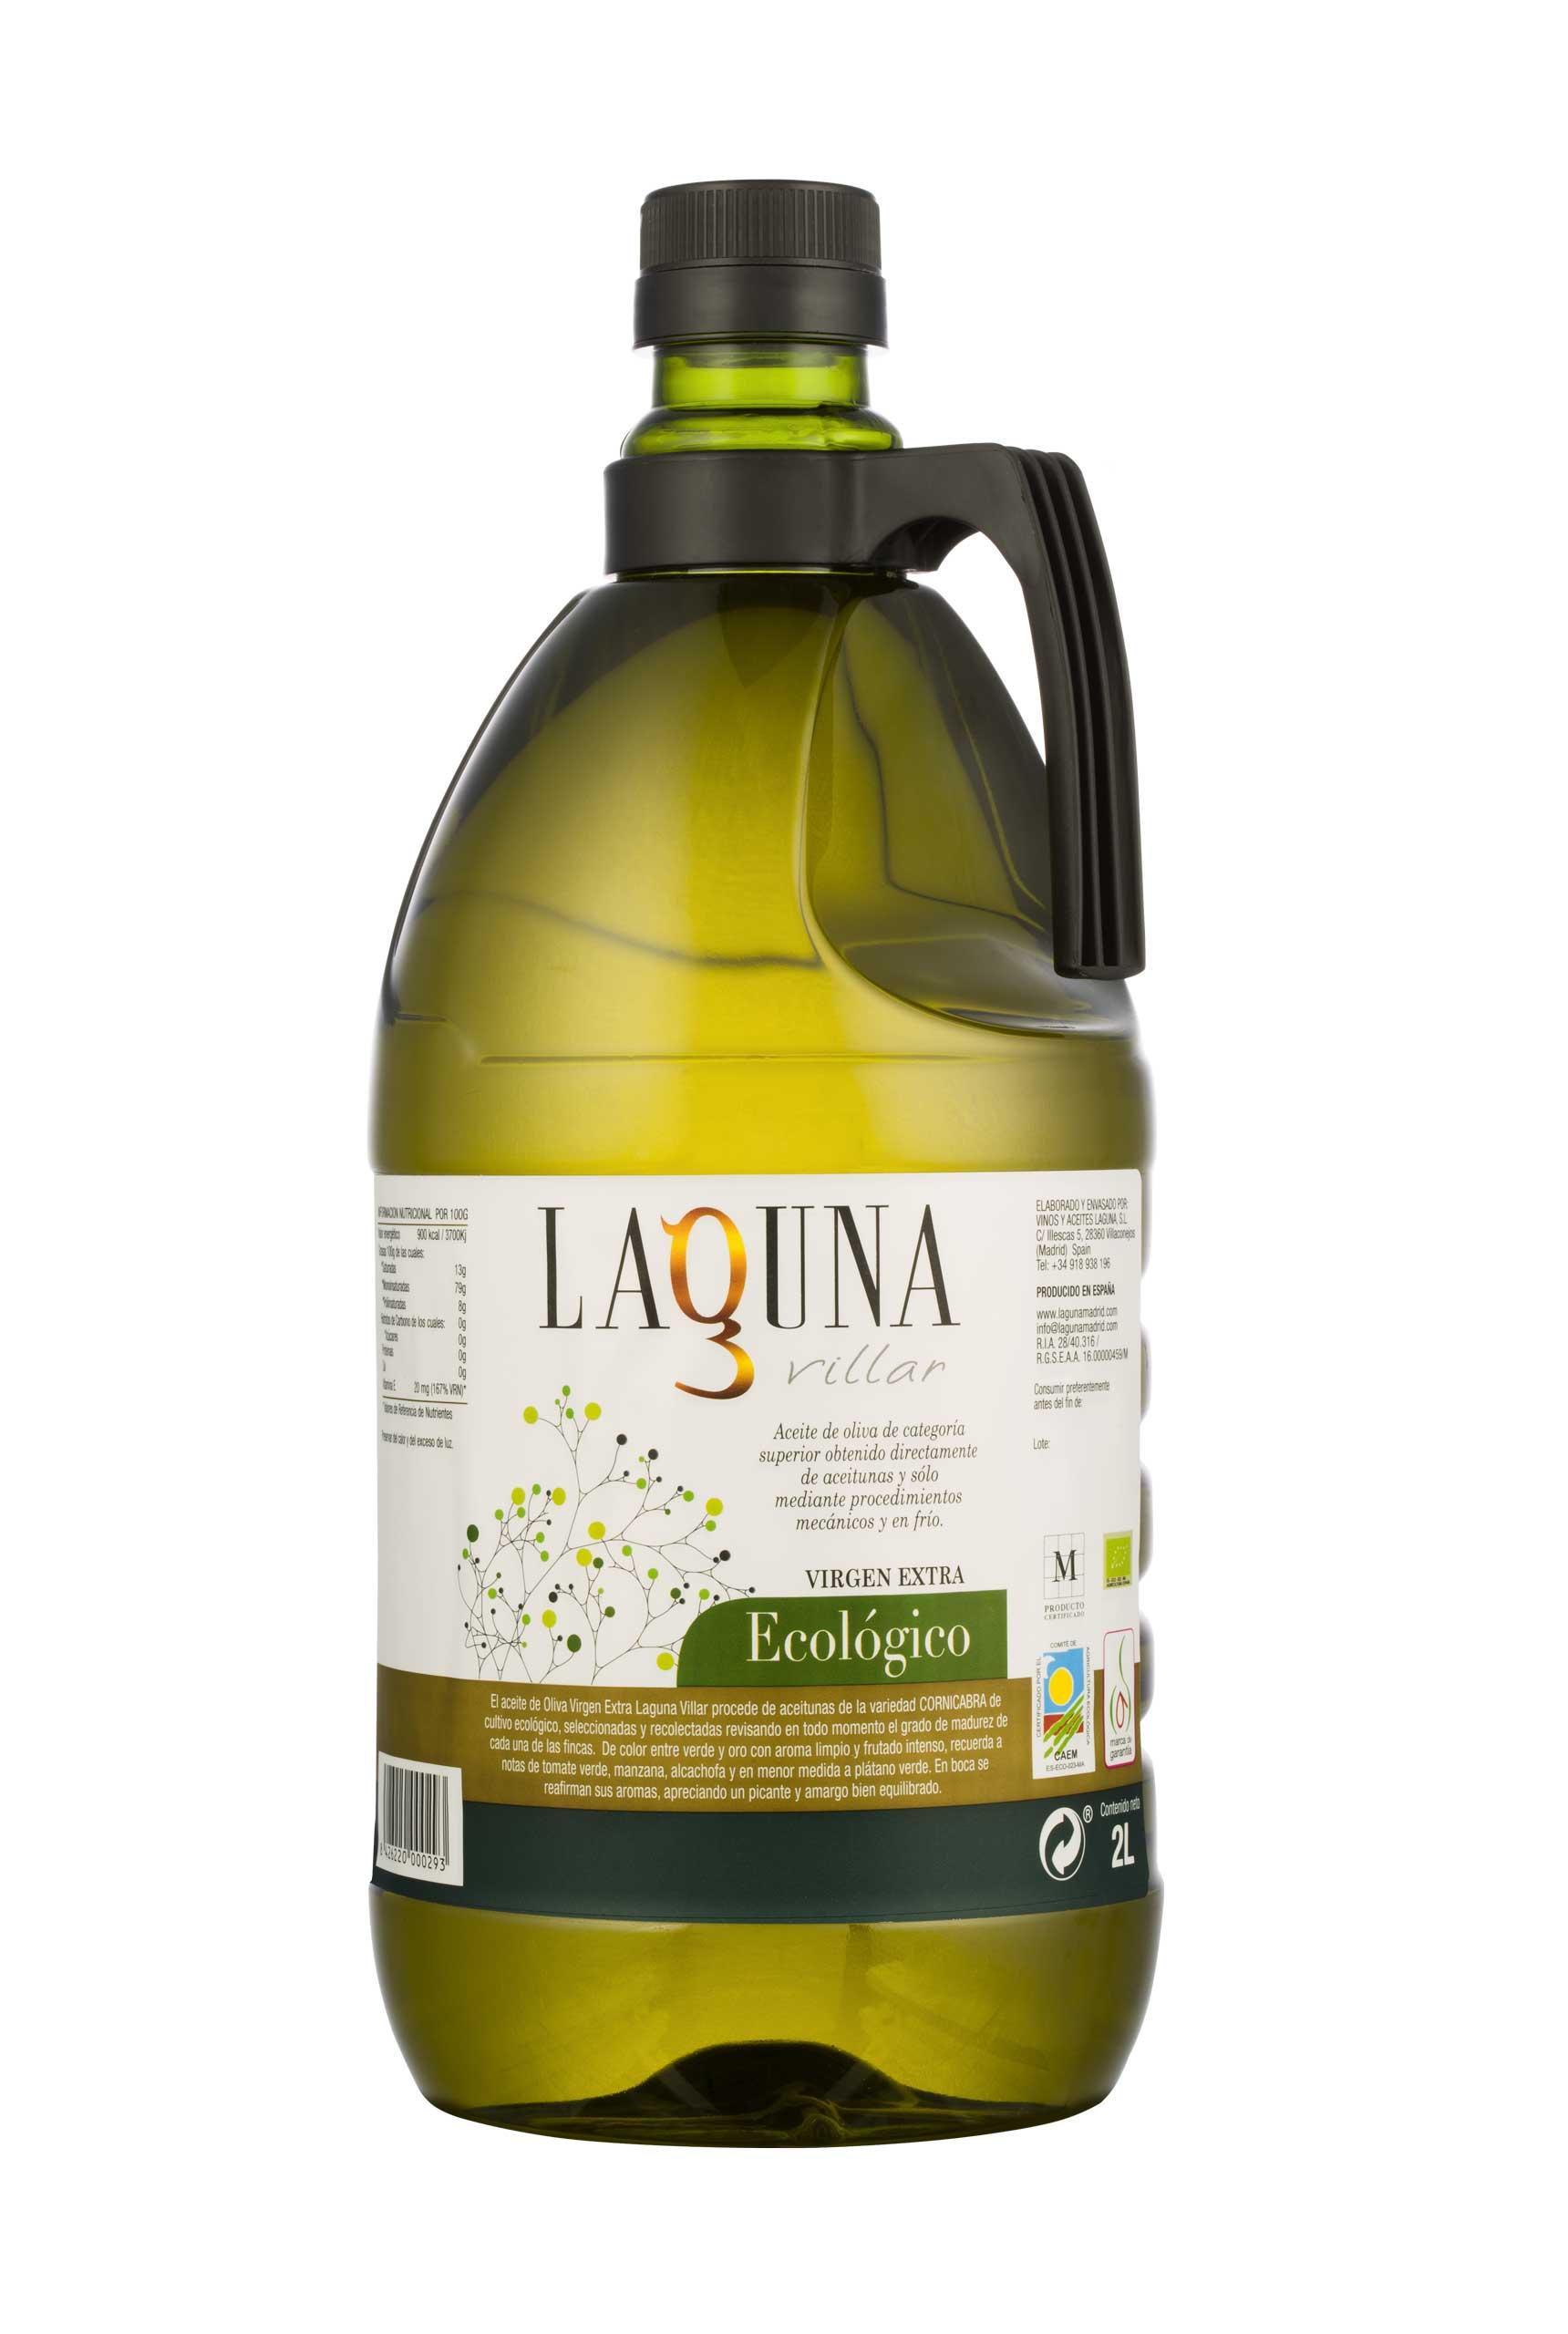 LAGUNA VILLAR - ECOLÓGICO - 2 Litros